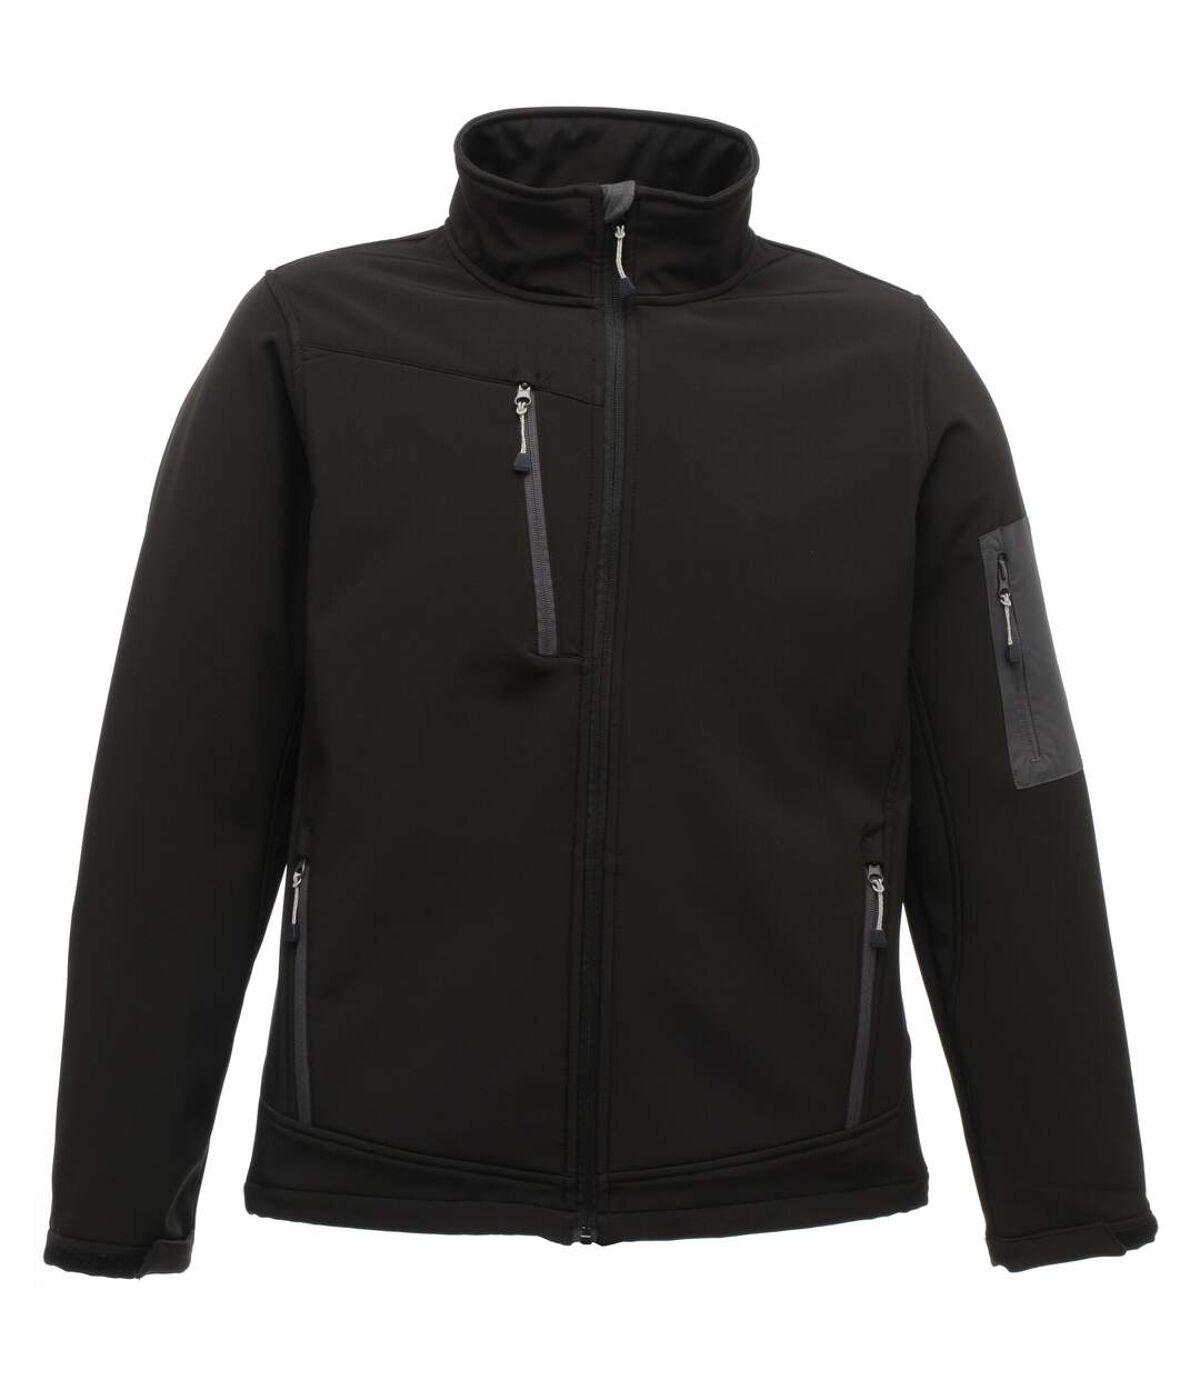 Regatta Standout Mens Arcola 3 Layer Softshell Jacket (Waterproof And Breathable) (Black / Seal Grey) - UTRW3691